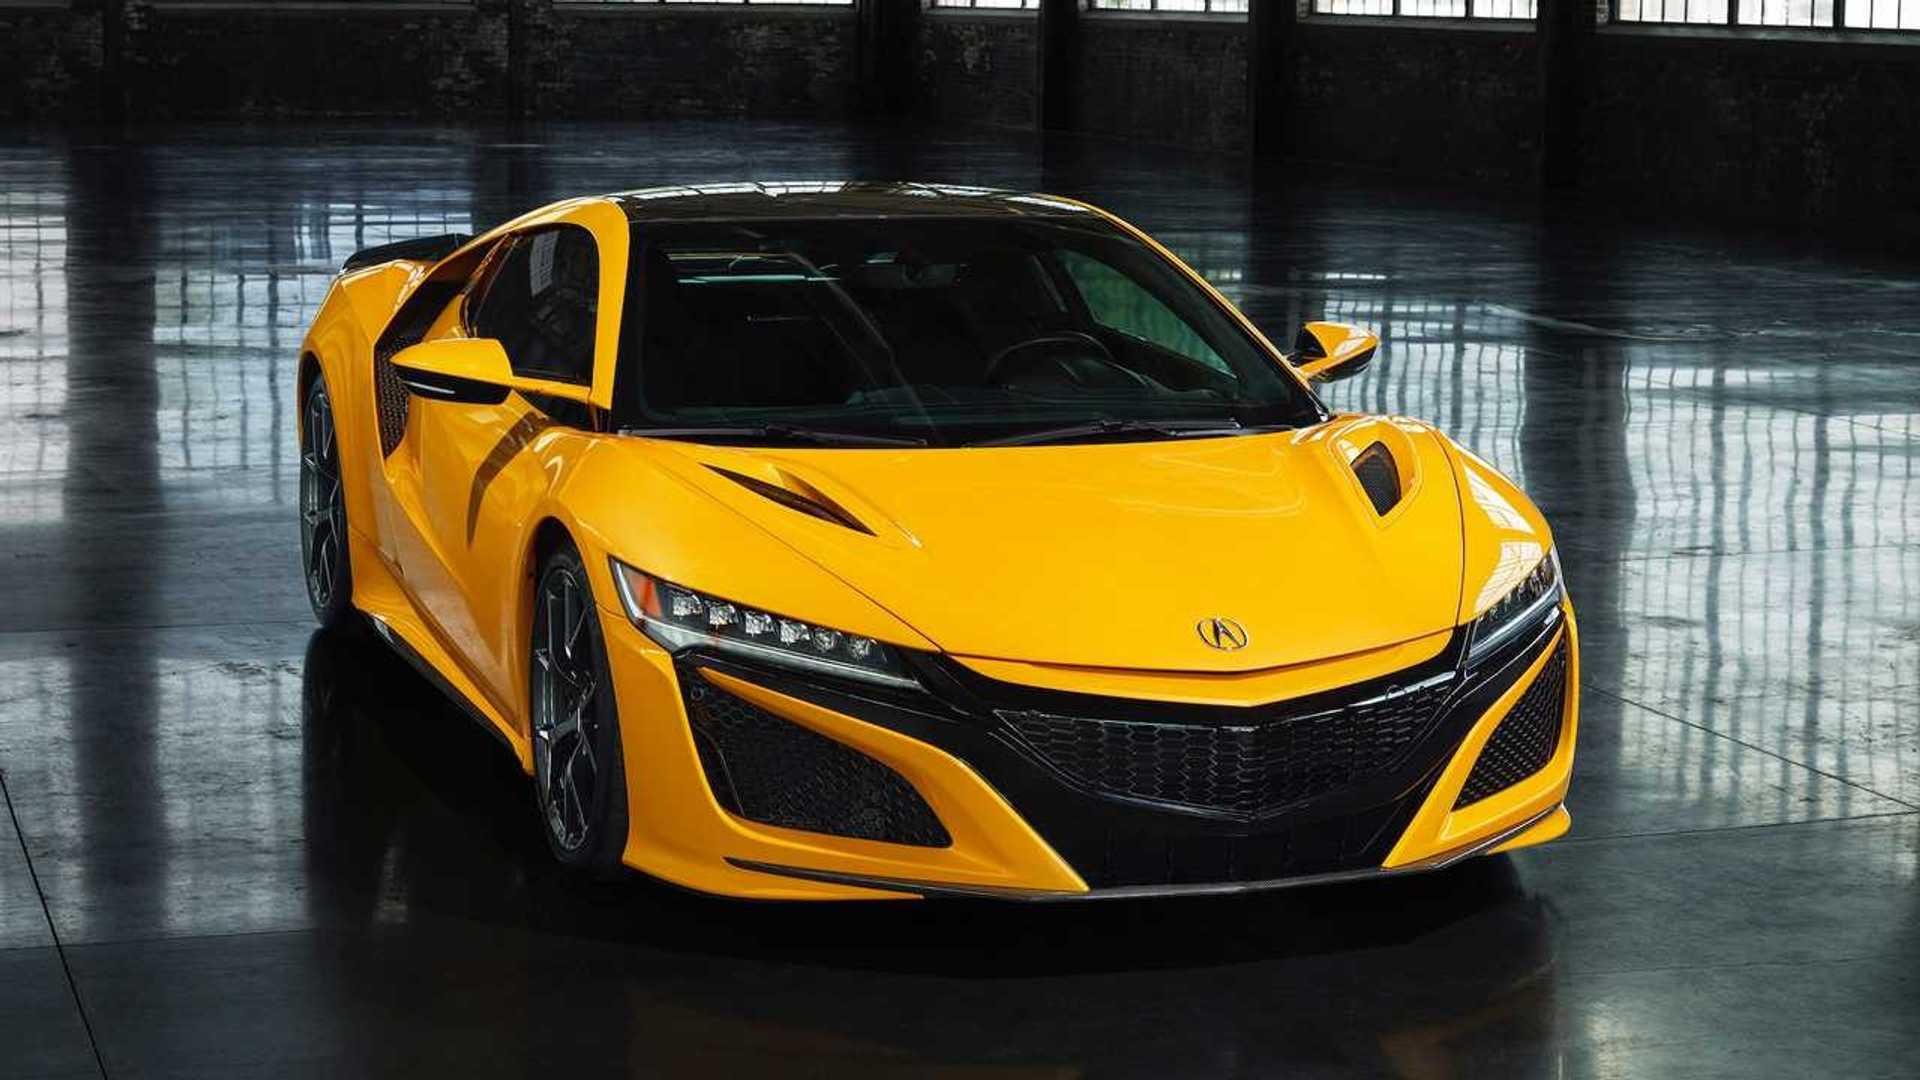 Indy Yellow Pearl: Acura | Motor1.com Photos